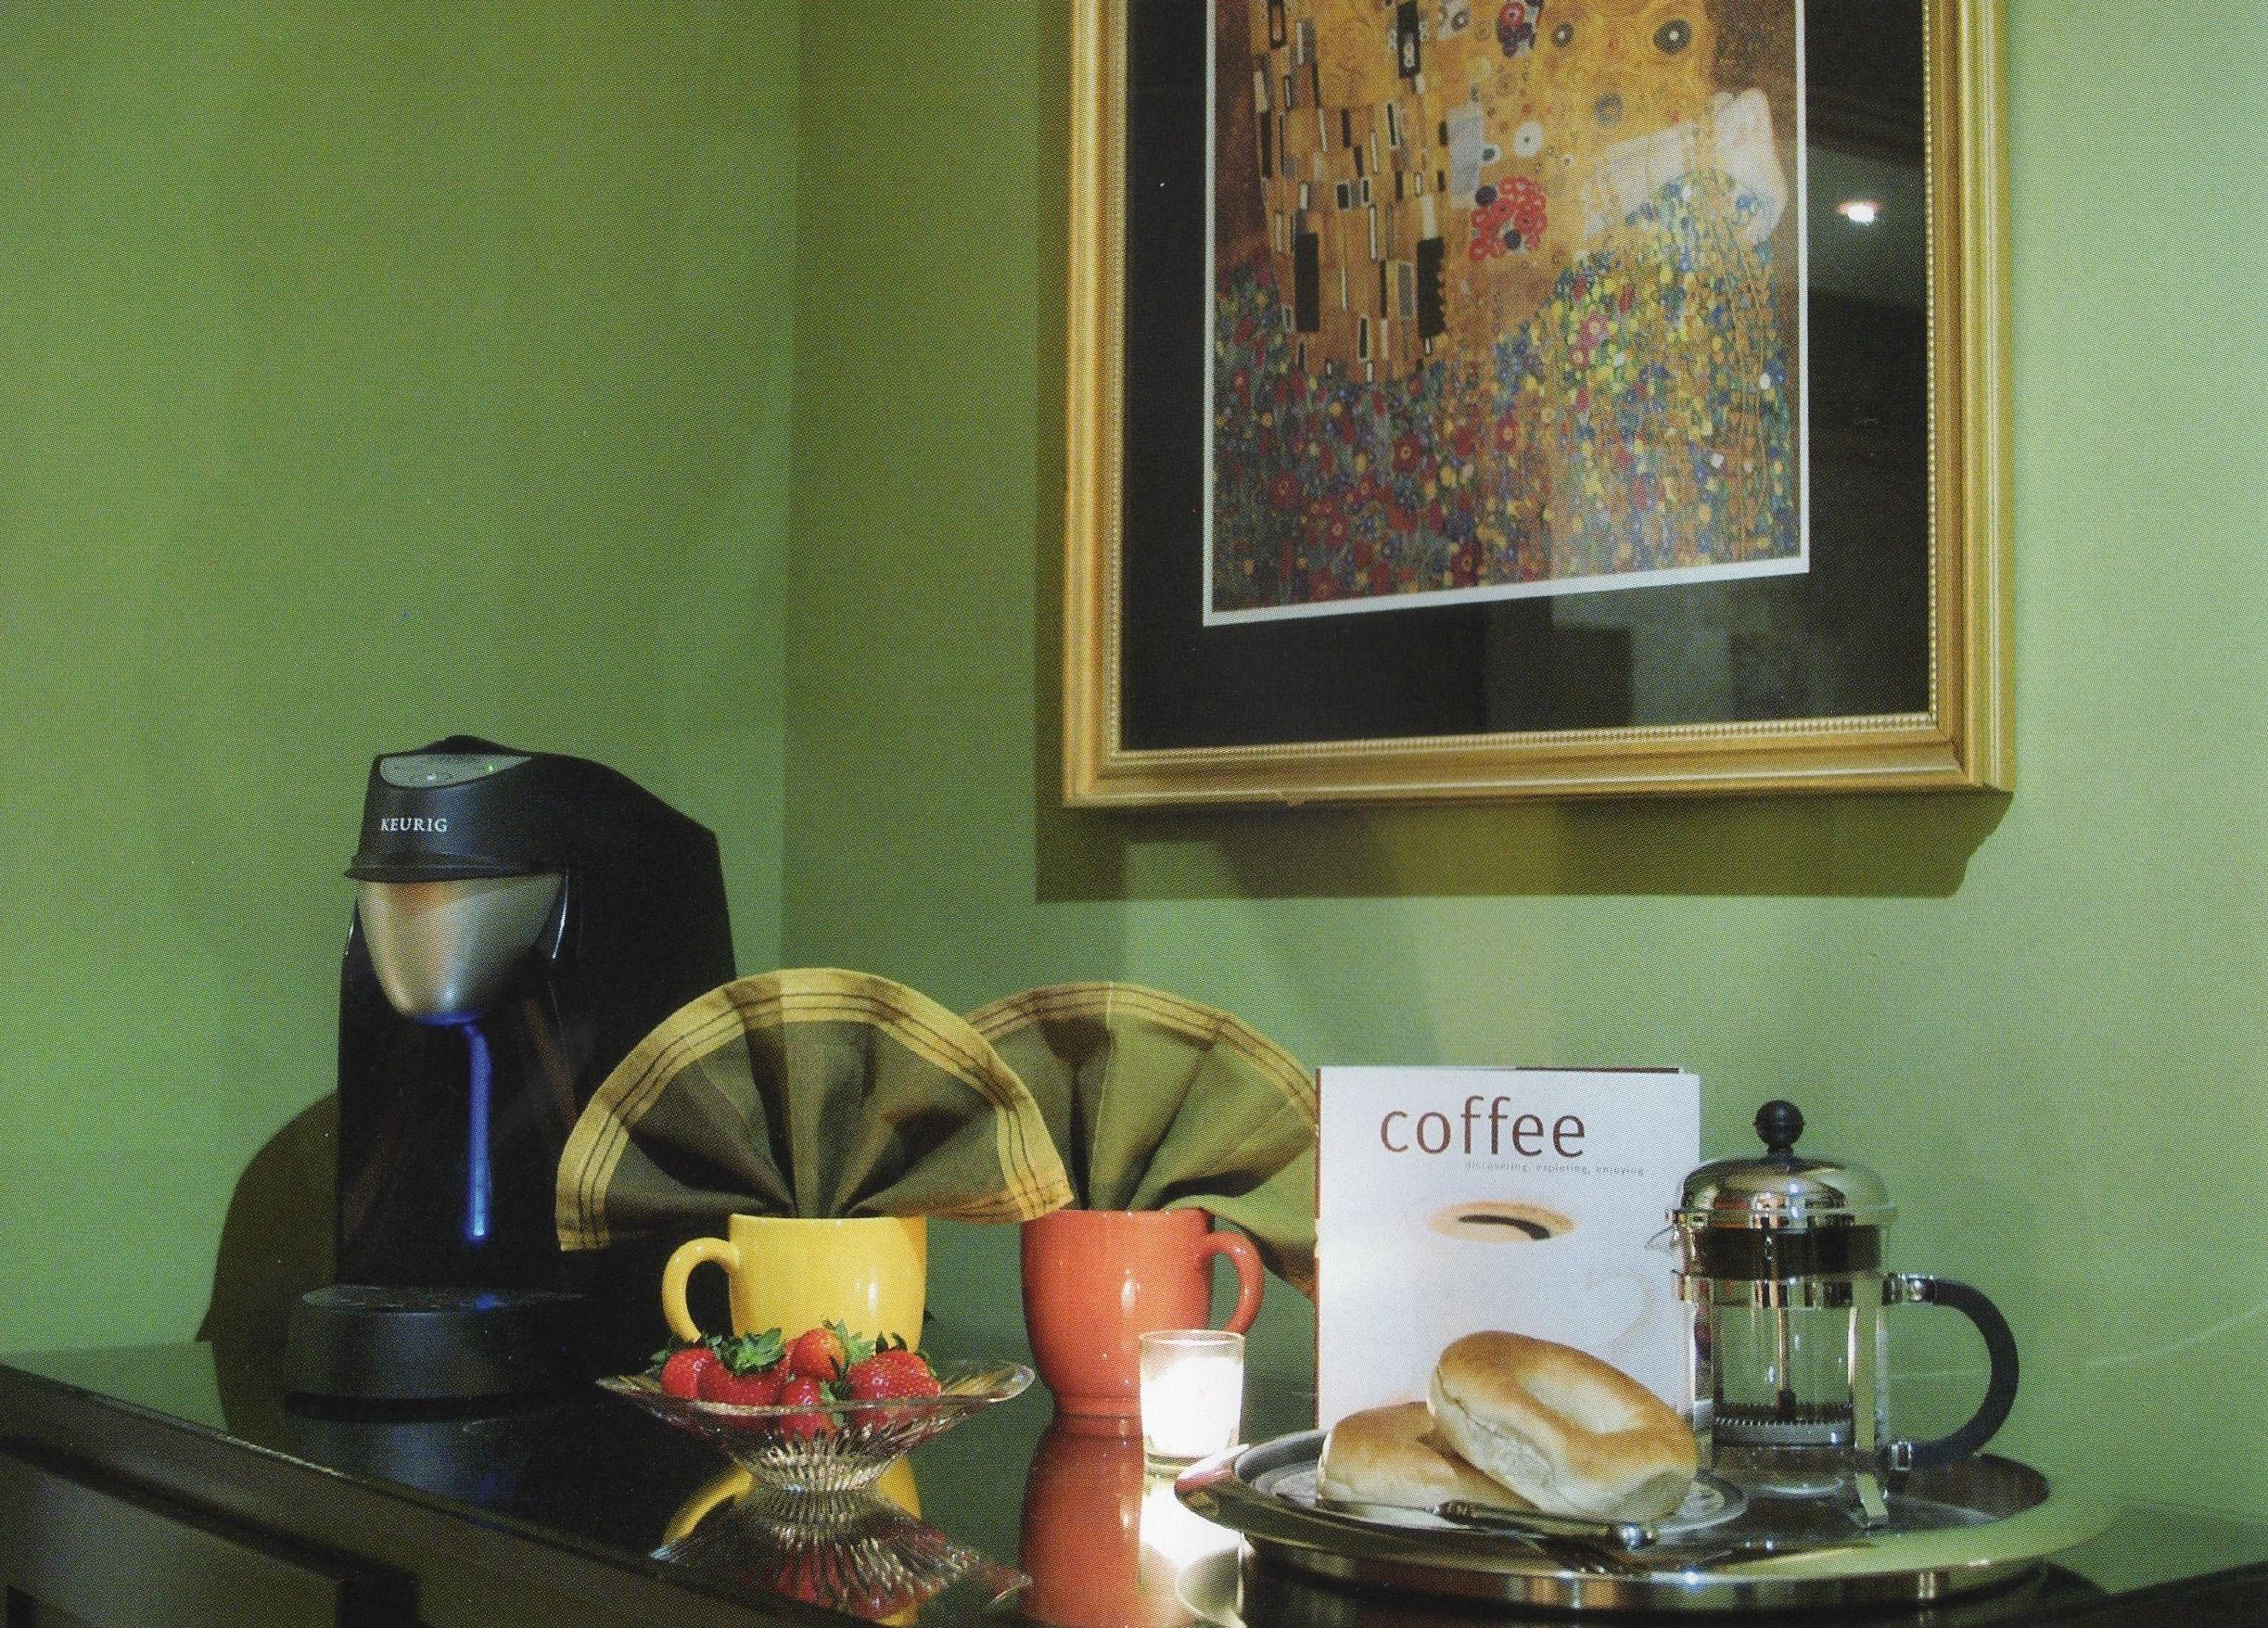 Coffee bar in master bedroom just before entering bath